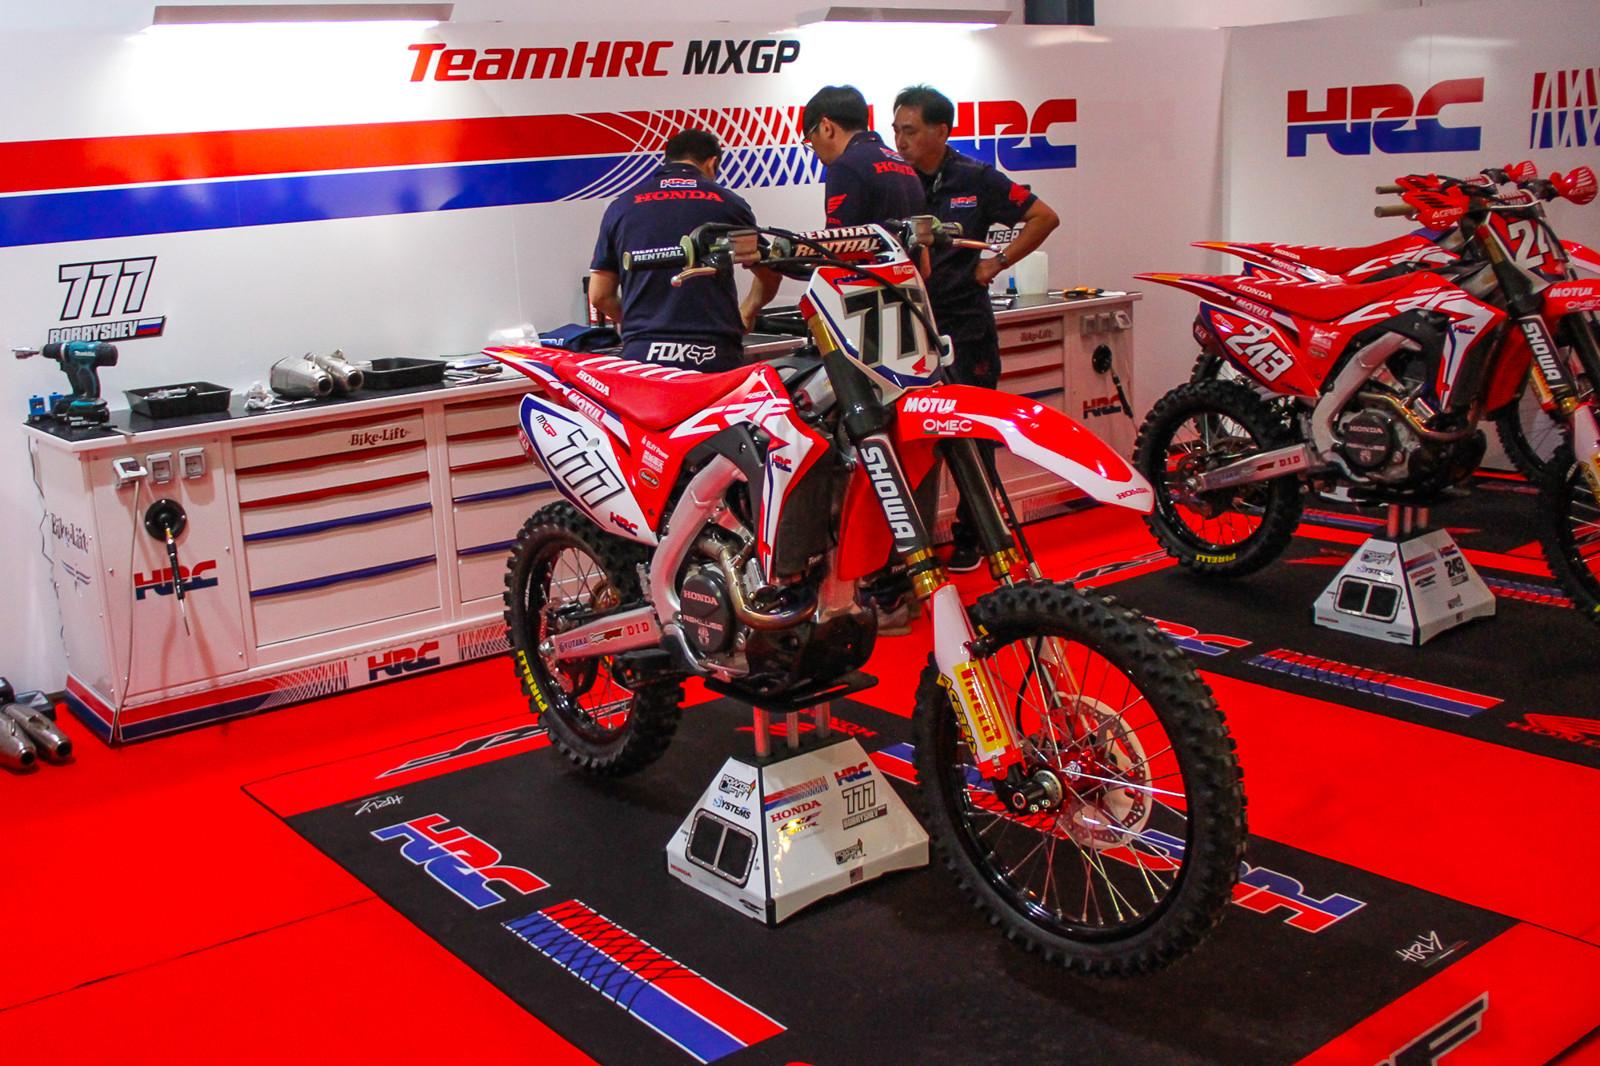 Team Honda HRC Gariboldi MXGP - Vital MX Pit Bits: 2017 MXGP of Qatar - Motocross Pictures - Vital MX